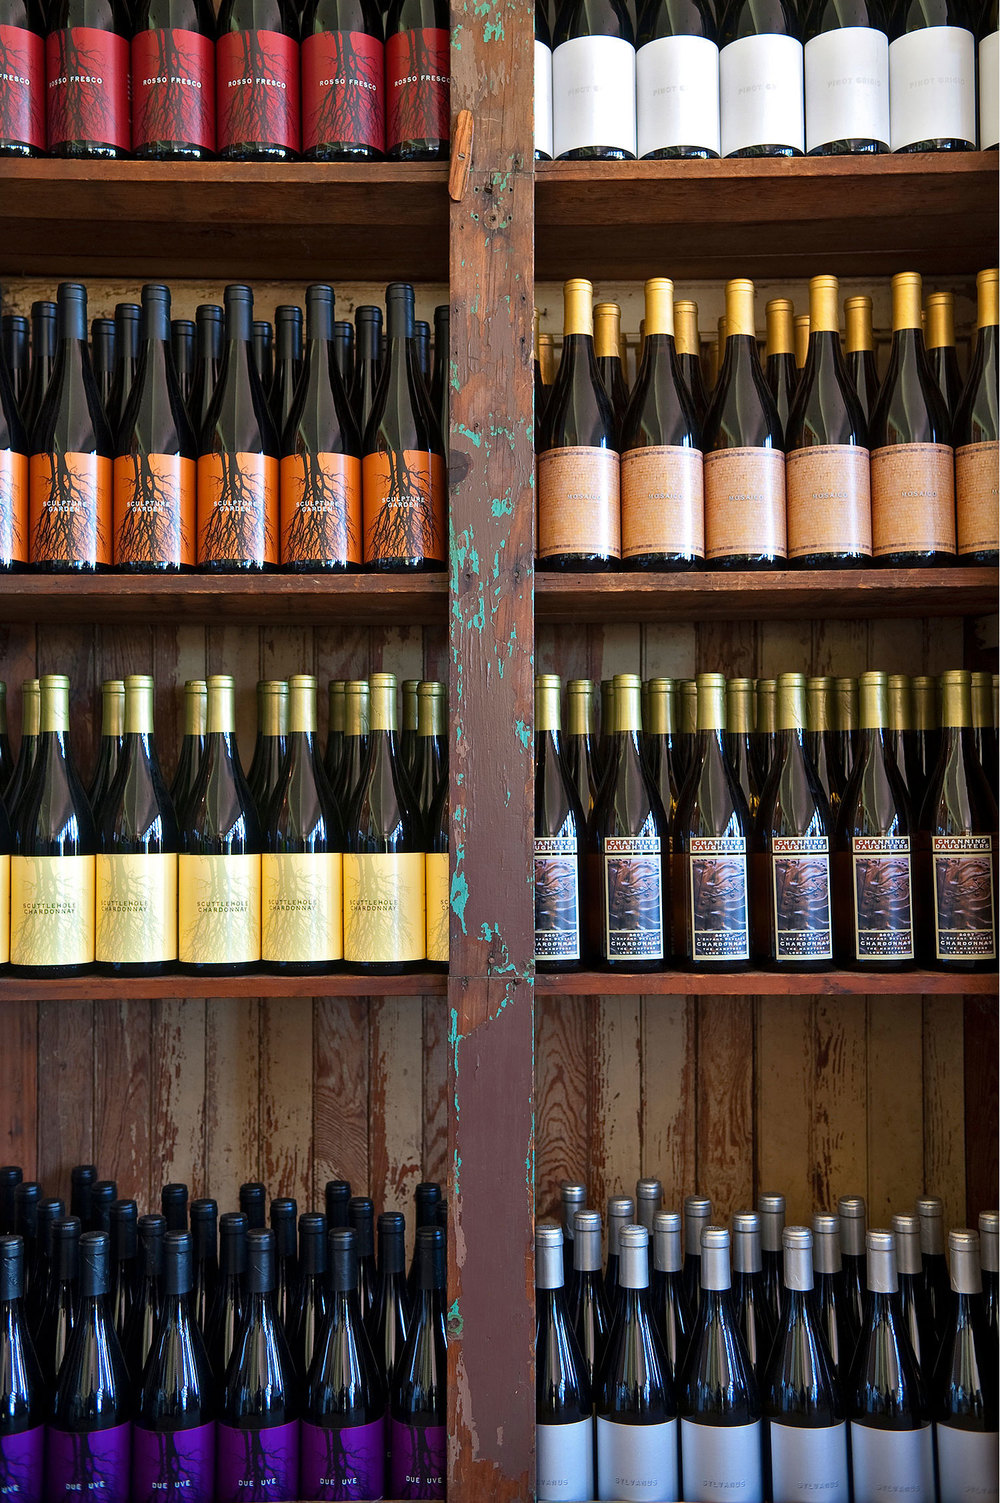 wine bottles in retail store